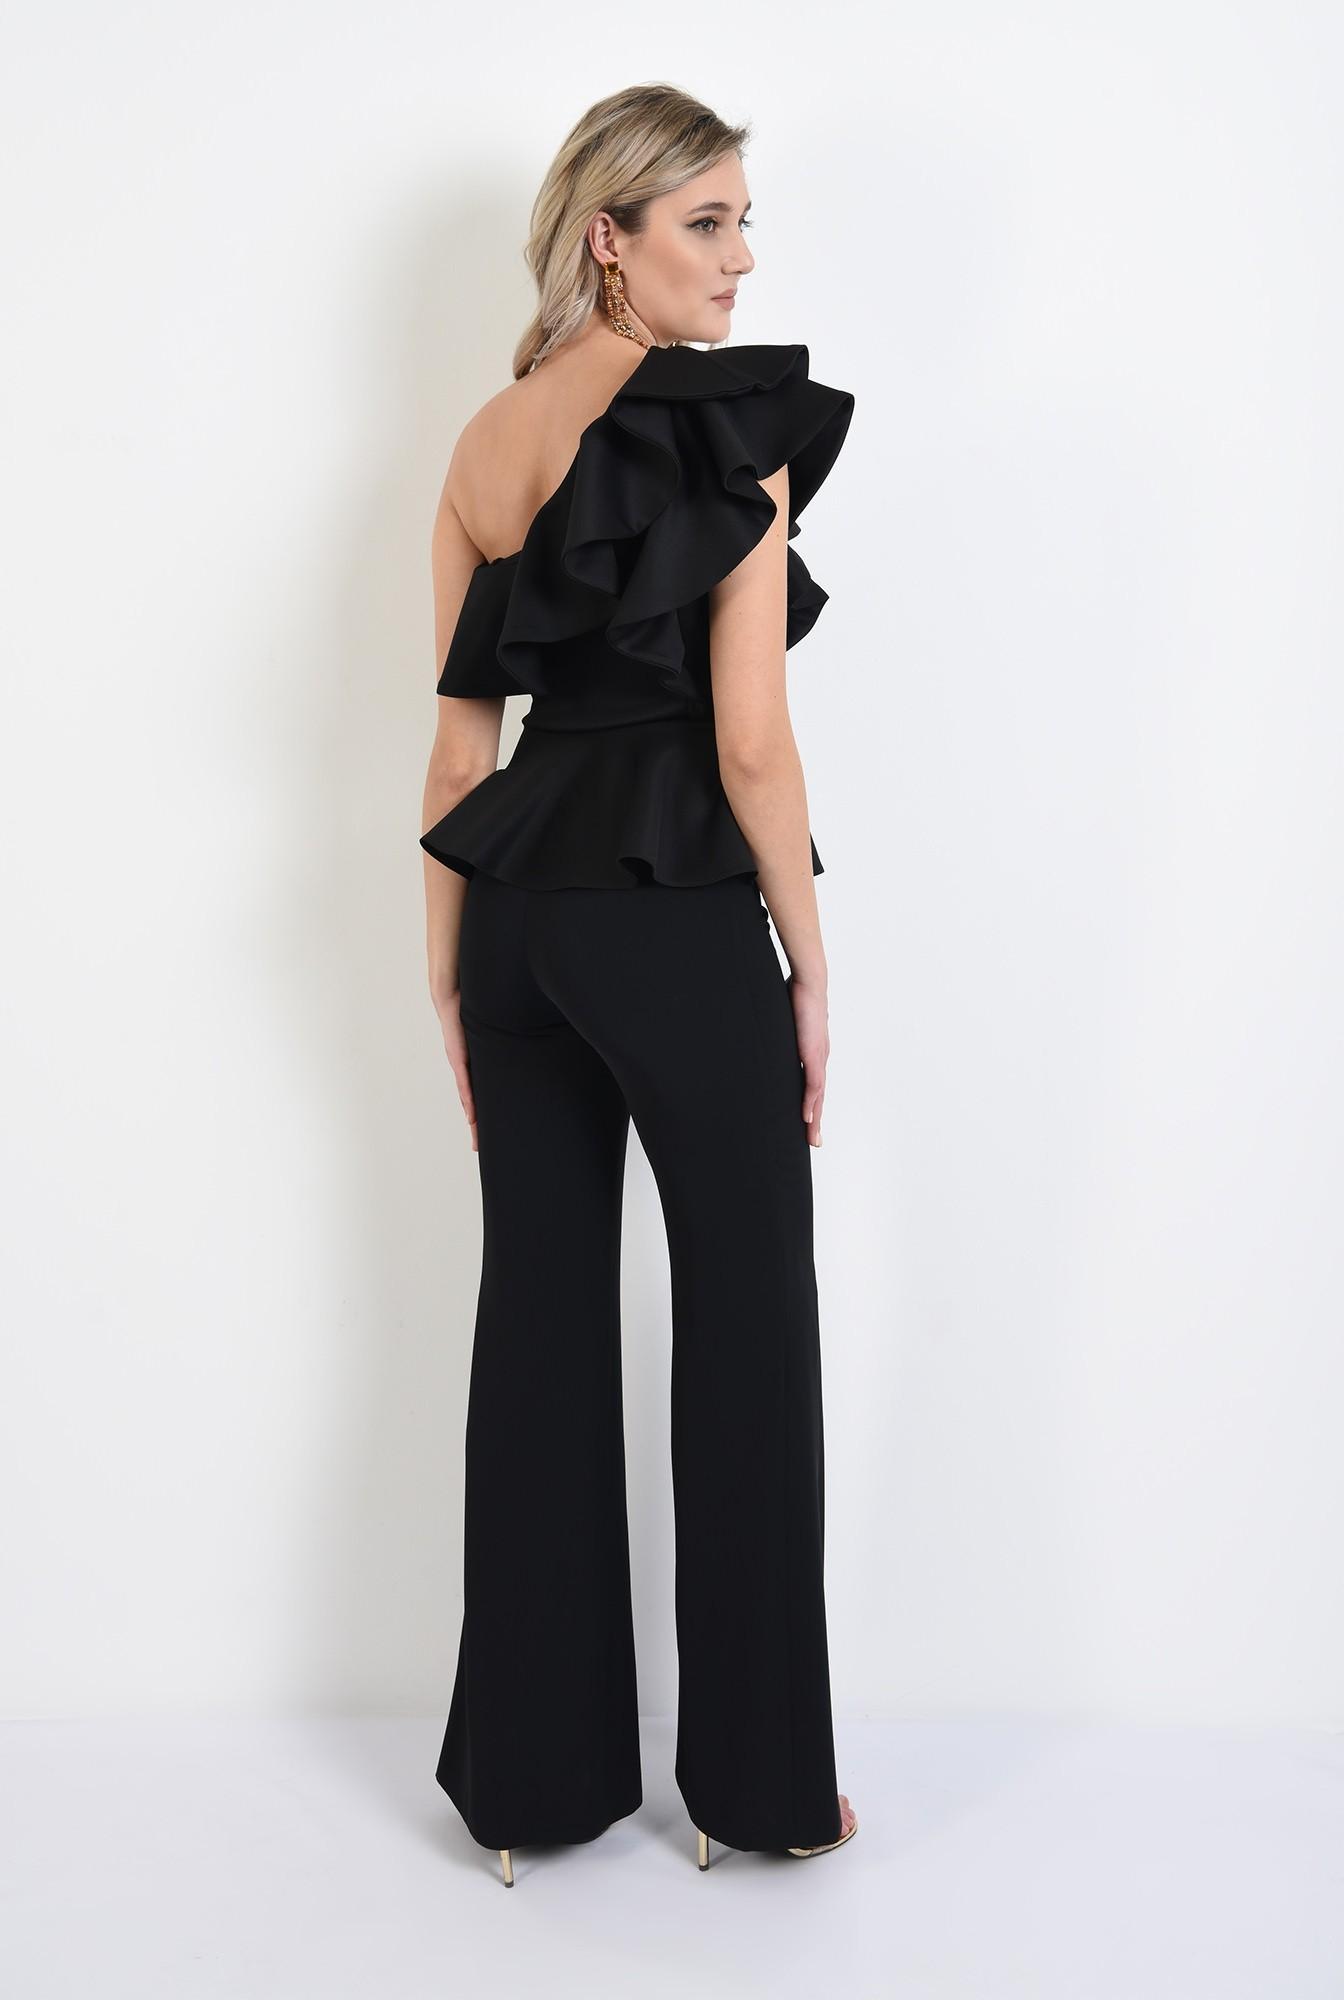 1 - 360 - bluza eleganta, neagra, cu volane, cu peplum, bluza de ocazie